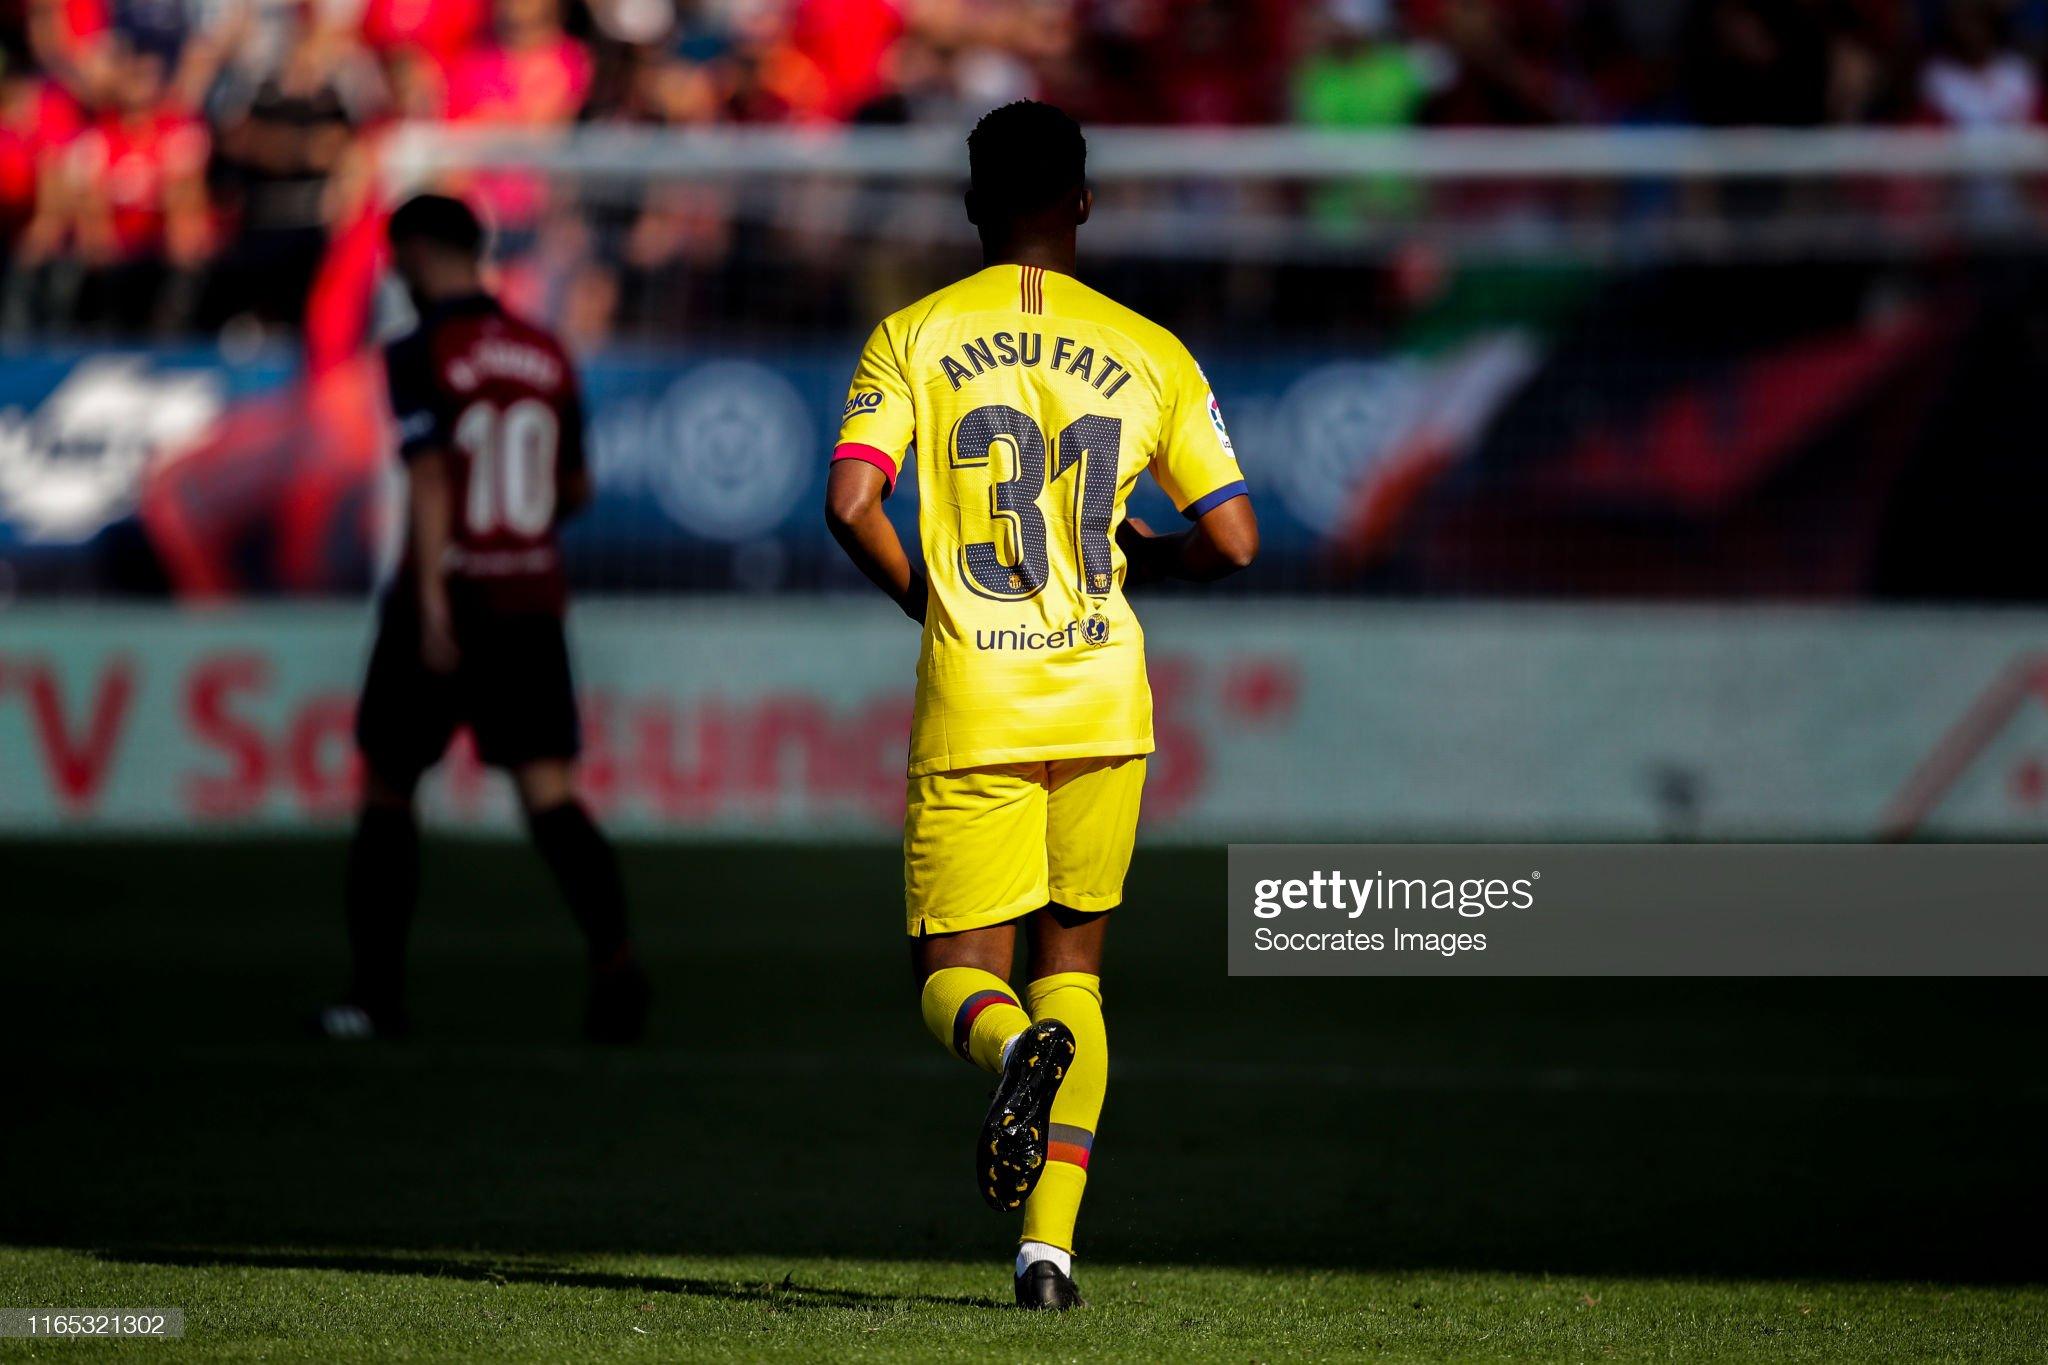 صور مباراة : أوساسونا - برشلونة 2-2 ( 31-08-2019 )  Ansu-fati-of-fc-barcelona-during-the-la-liga-santander-match-between-picture-id1165321302?s=2048x2048